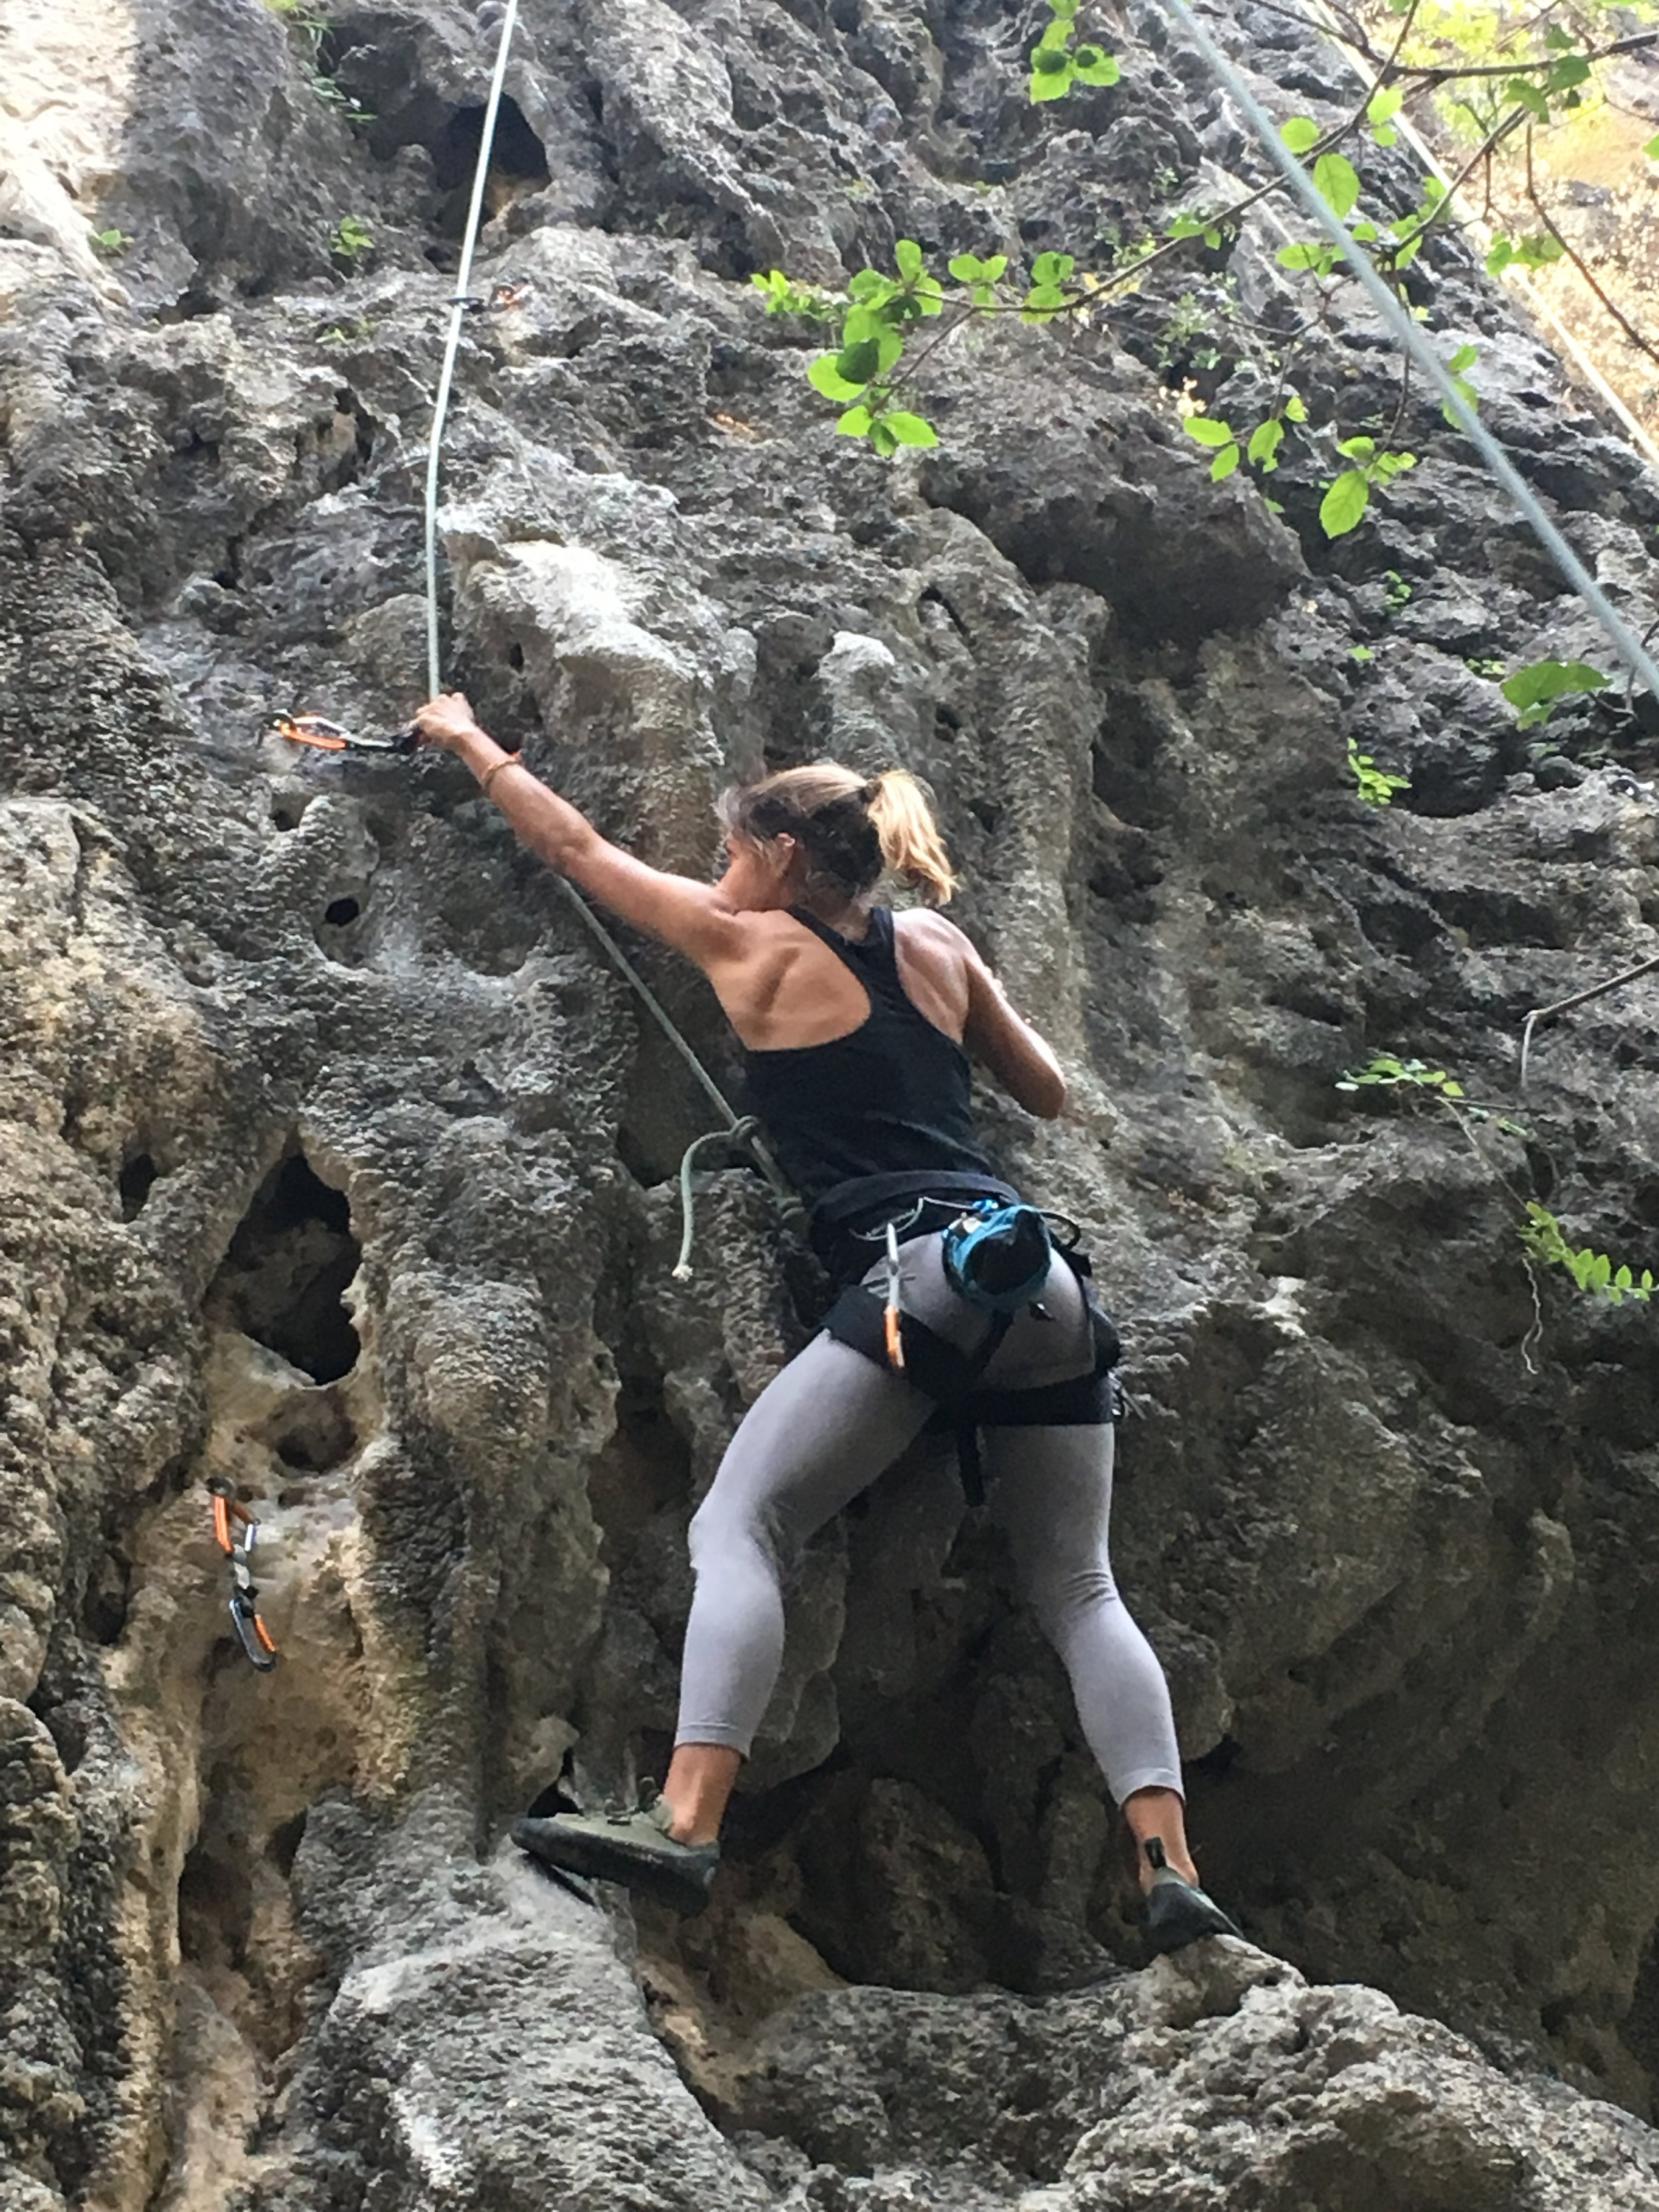 Me, climbing